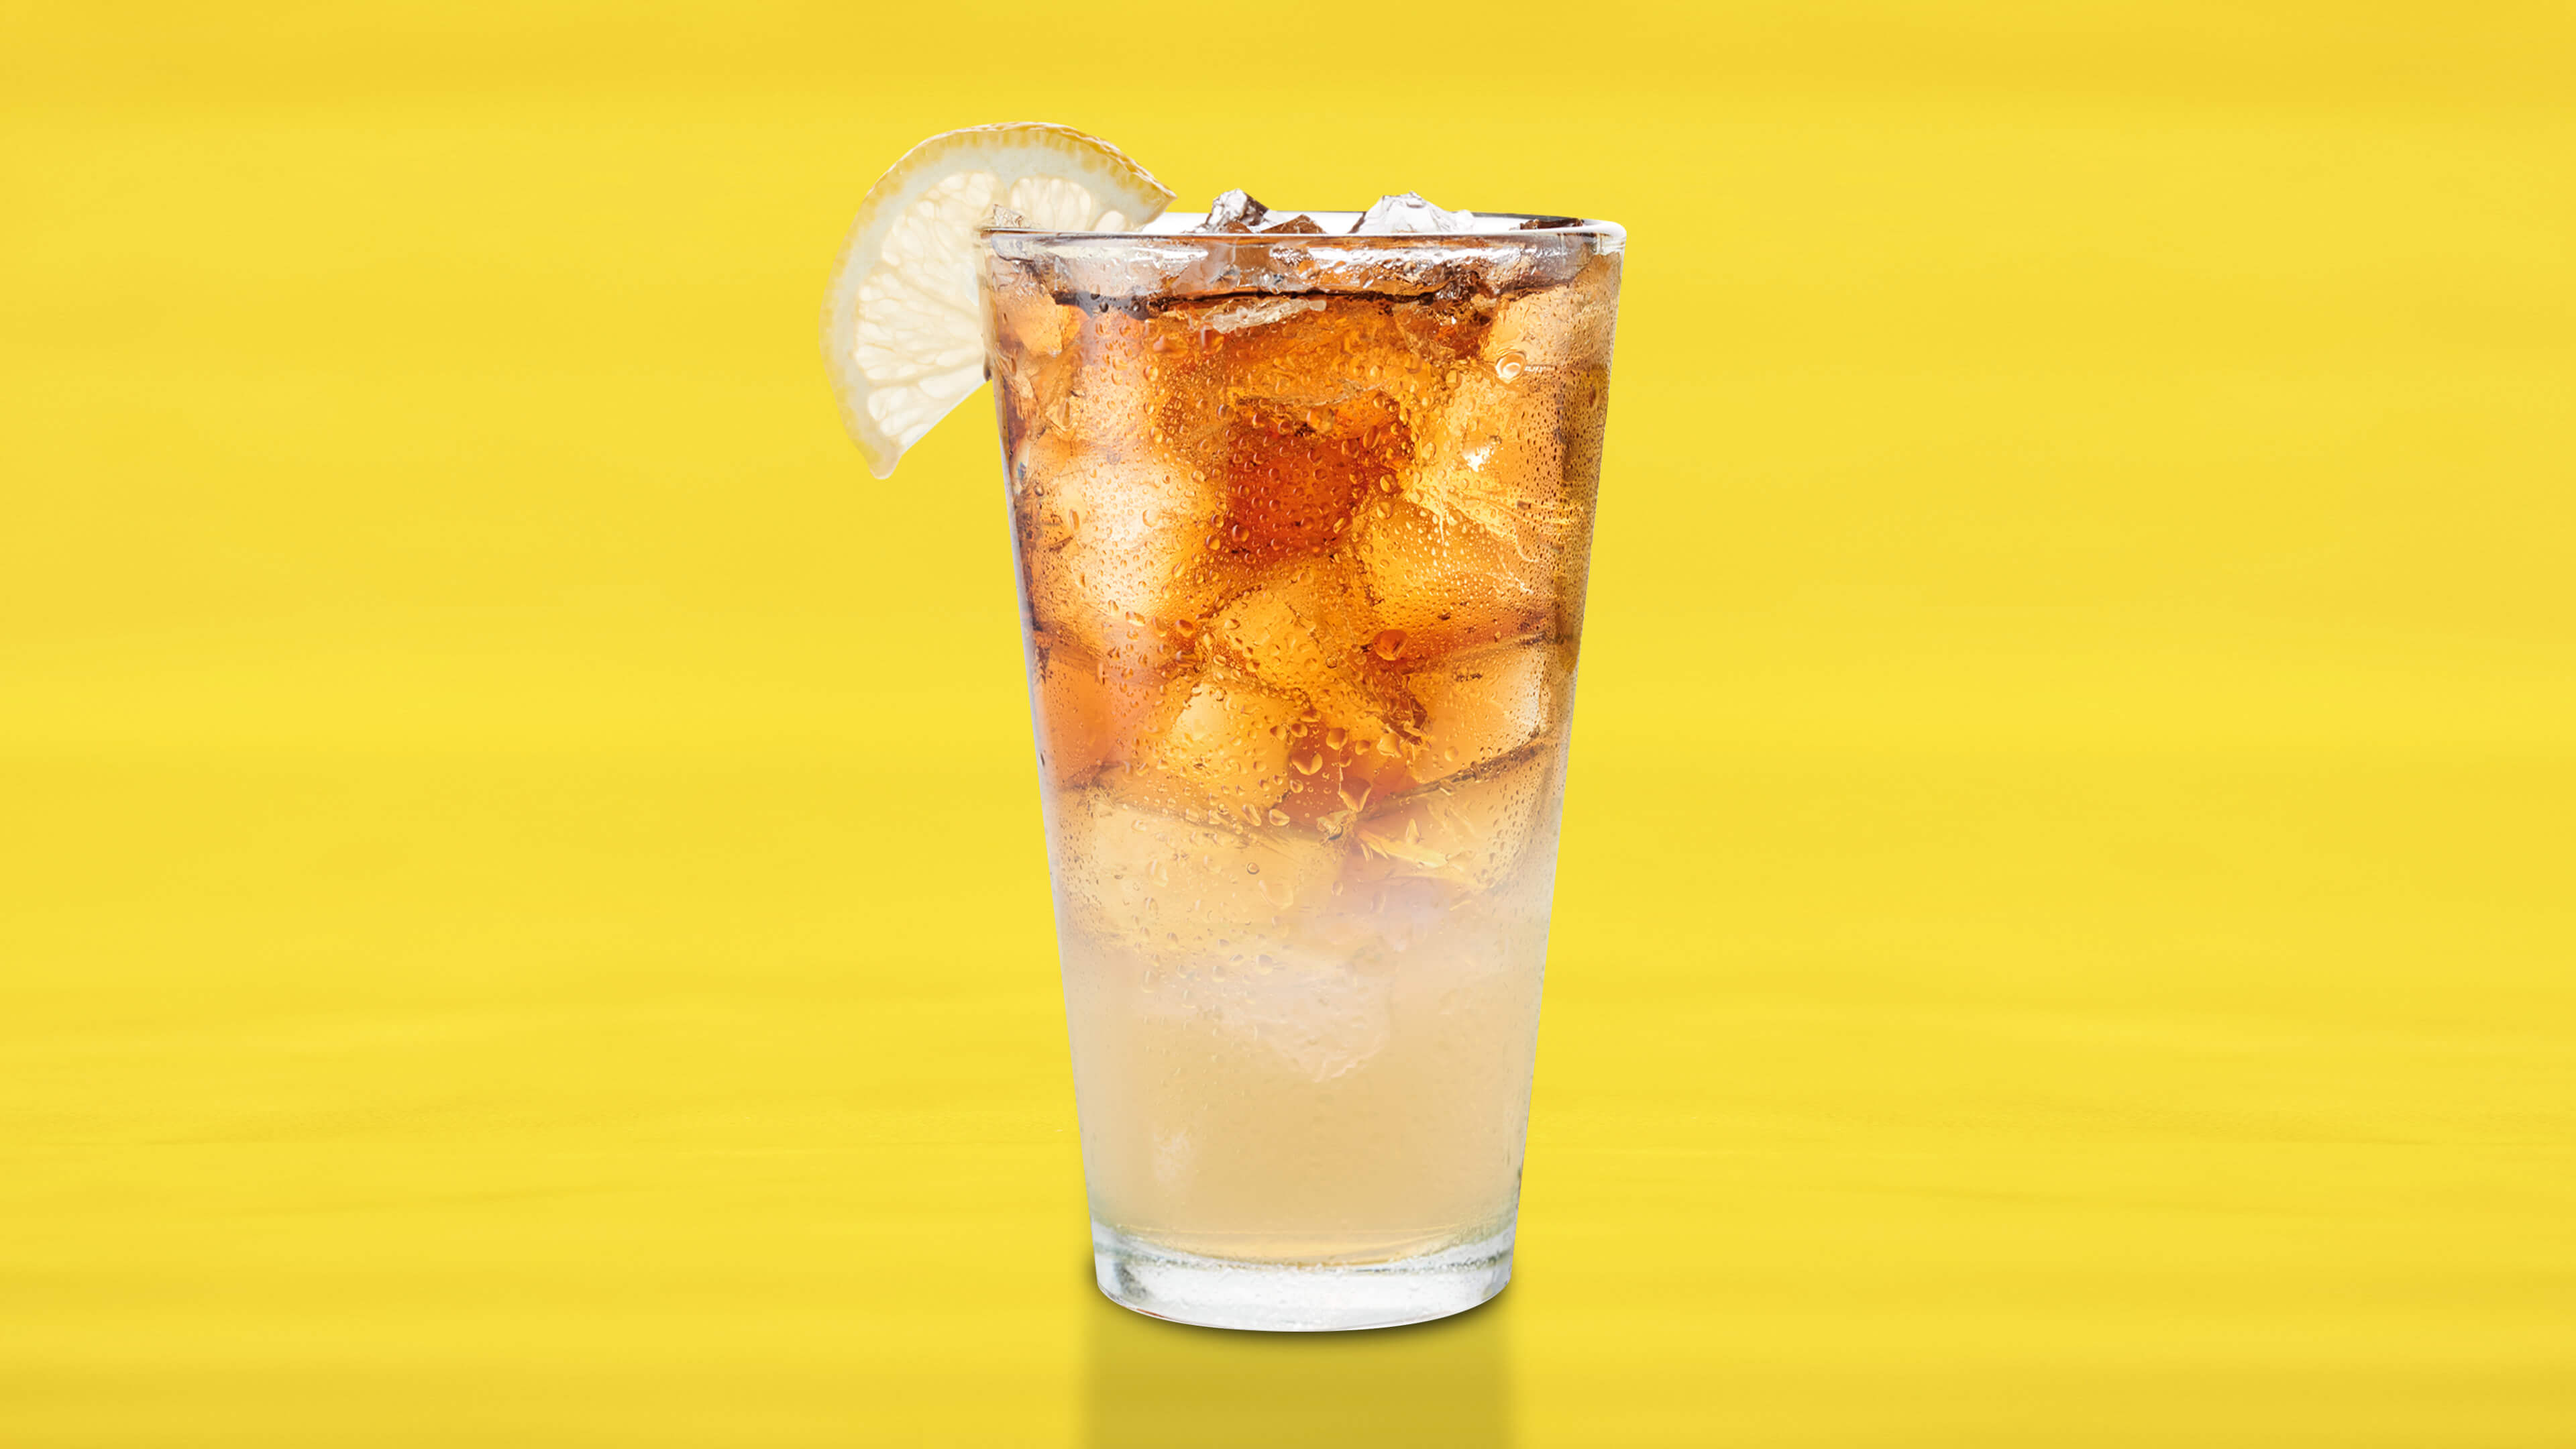 KHALIFA PALMER - Refreshing iced tea and lemonade collide for Wiz's signature sip.